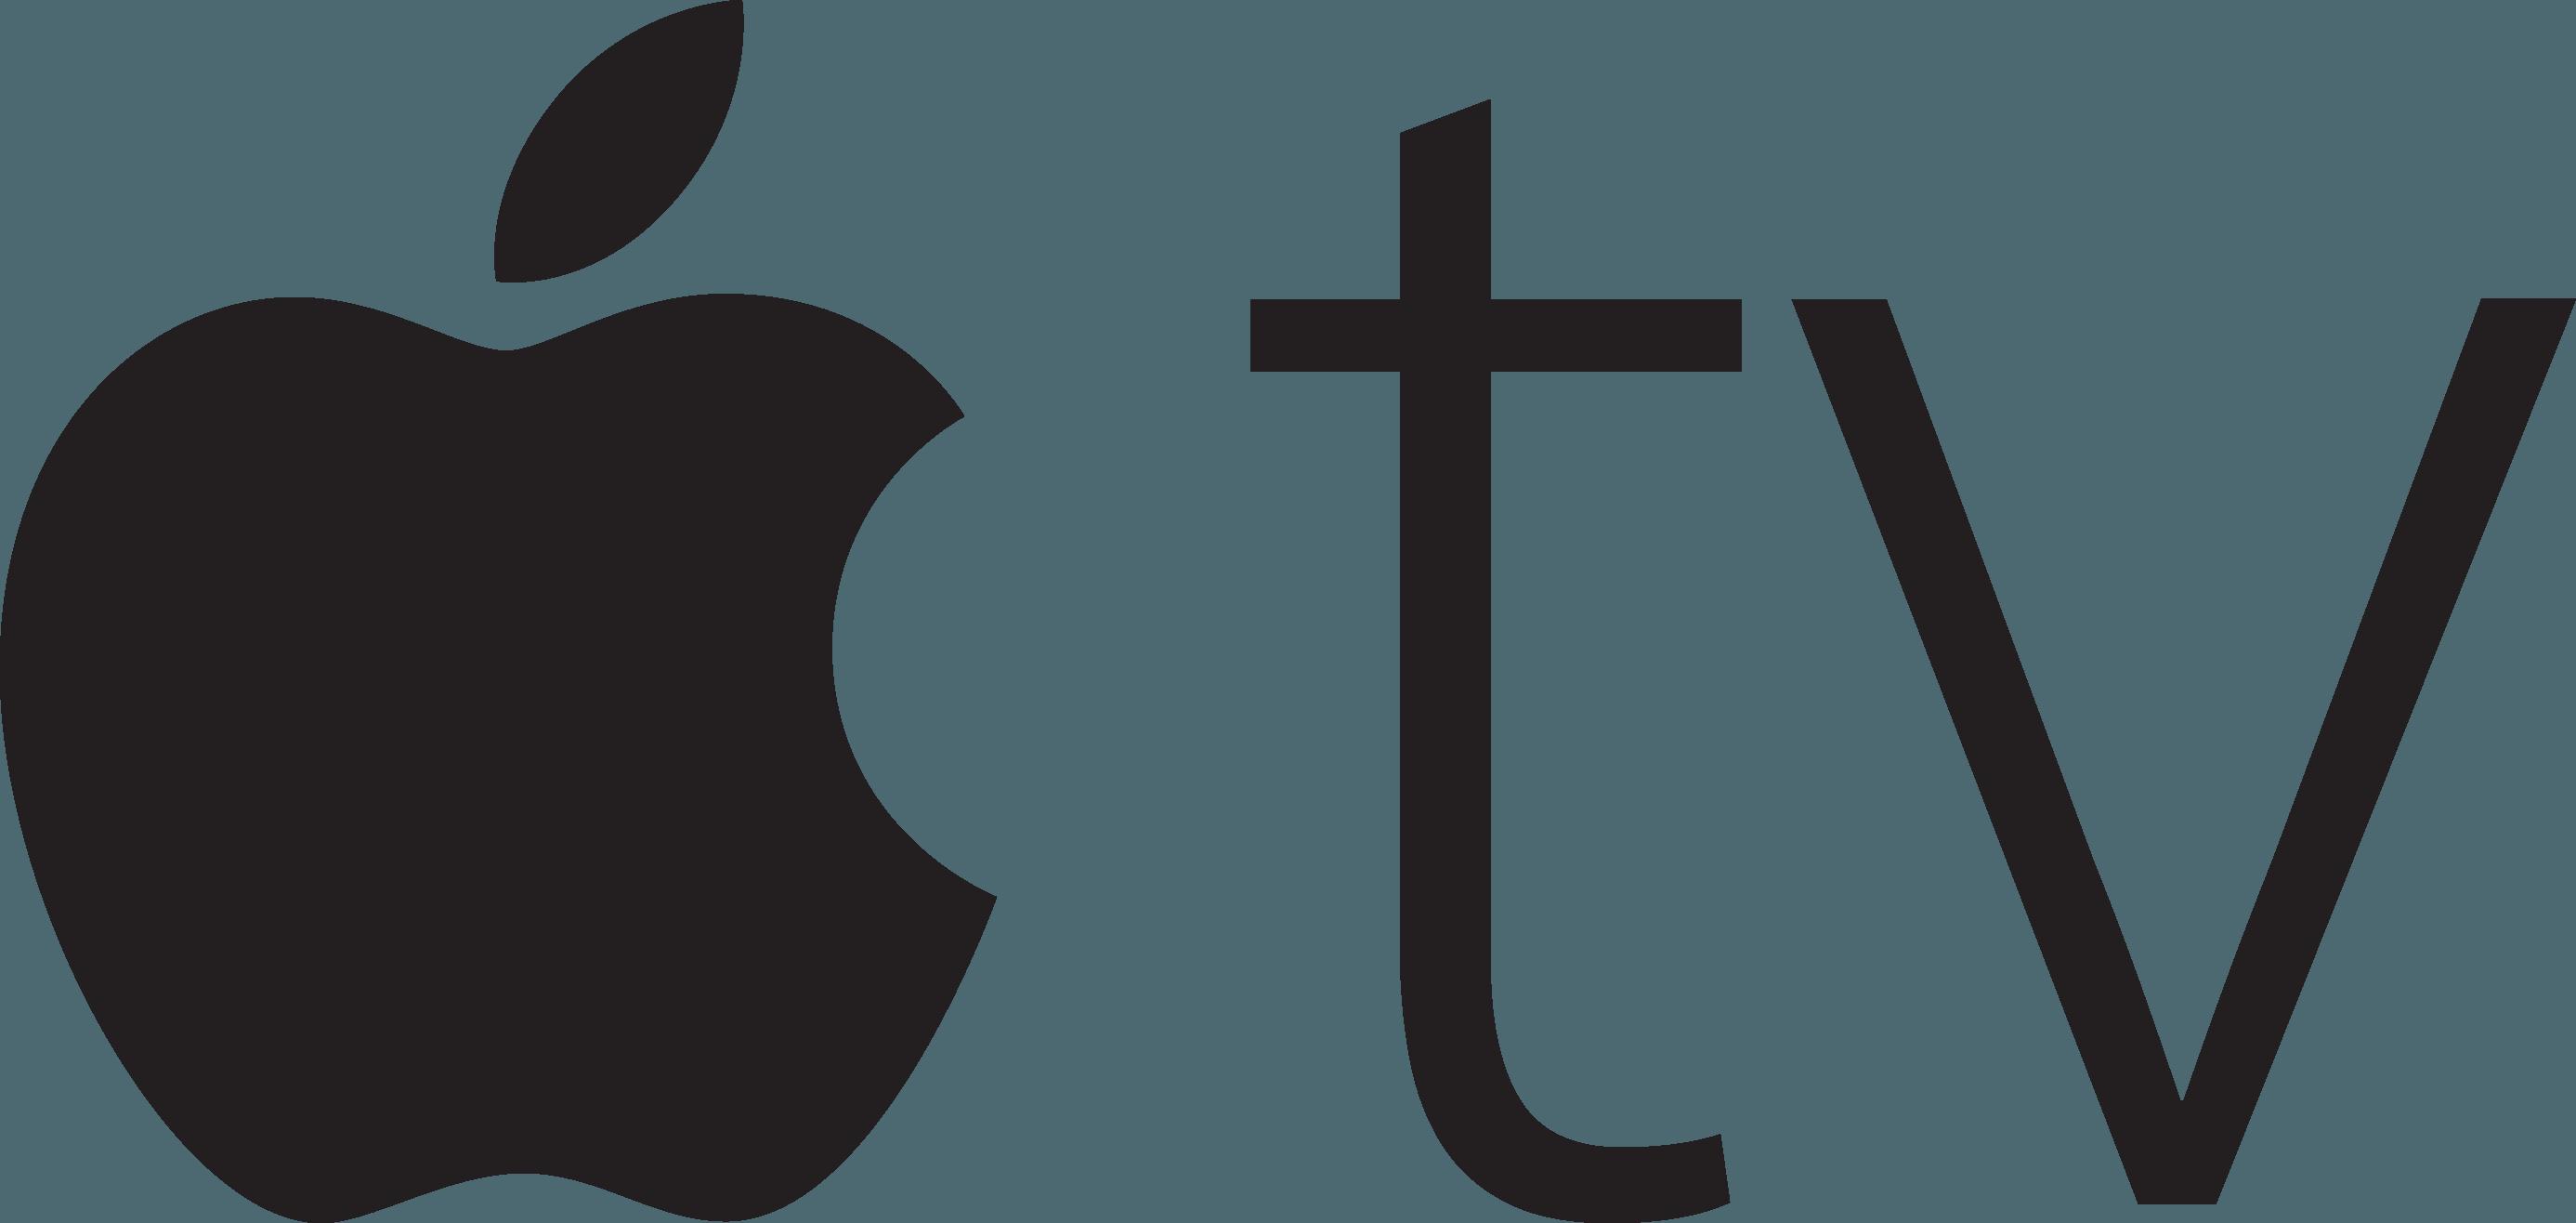 Apple TV Logo Vector EPS Free Download, Logo, Icons, Brand Emblems